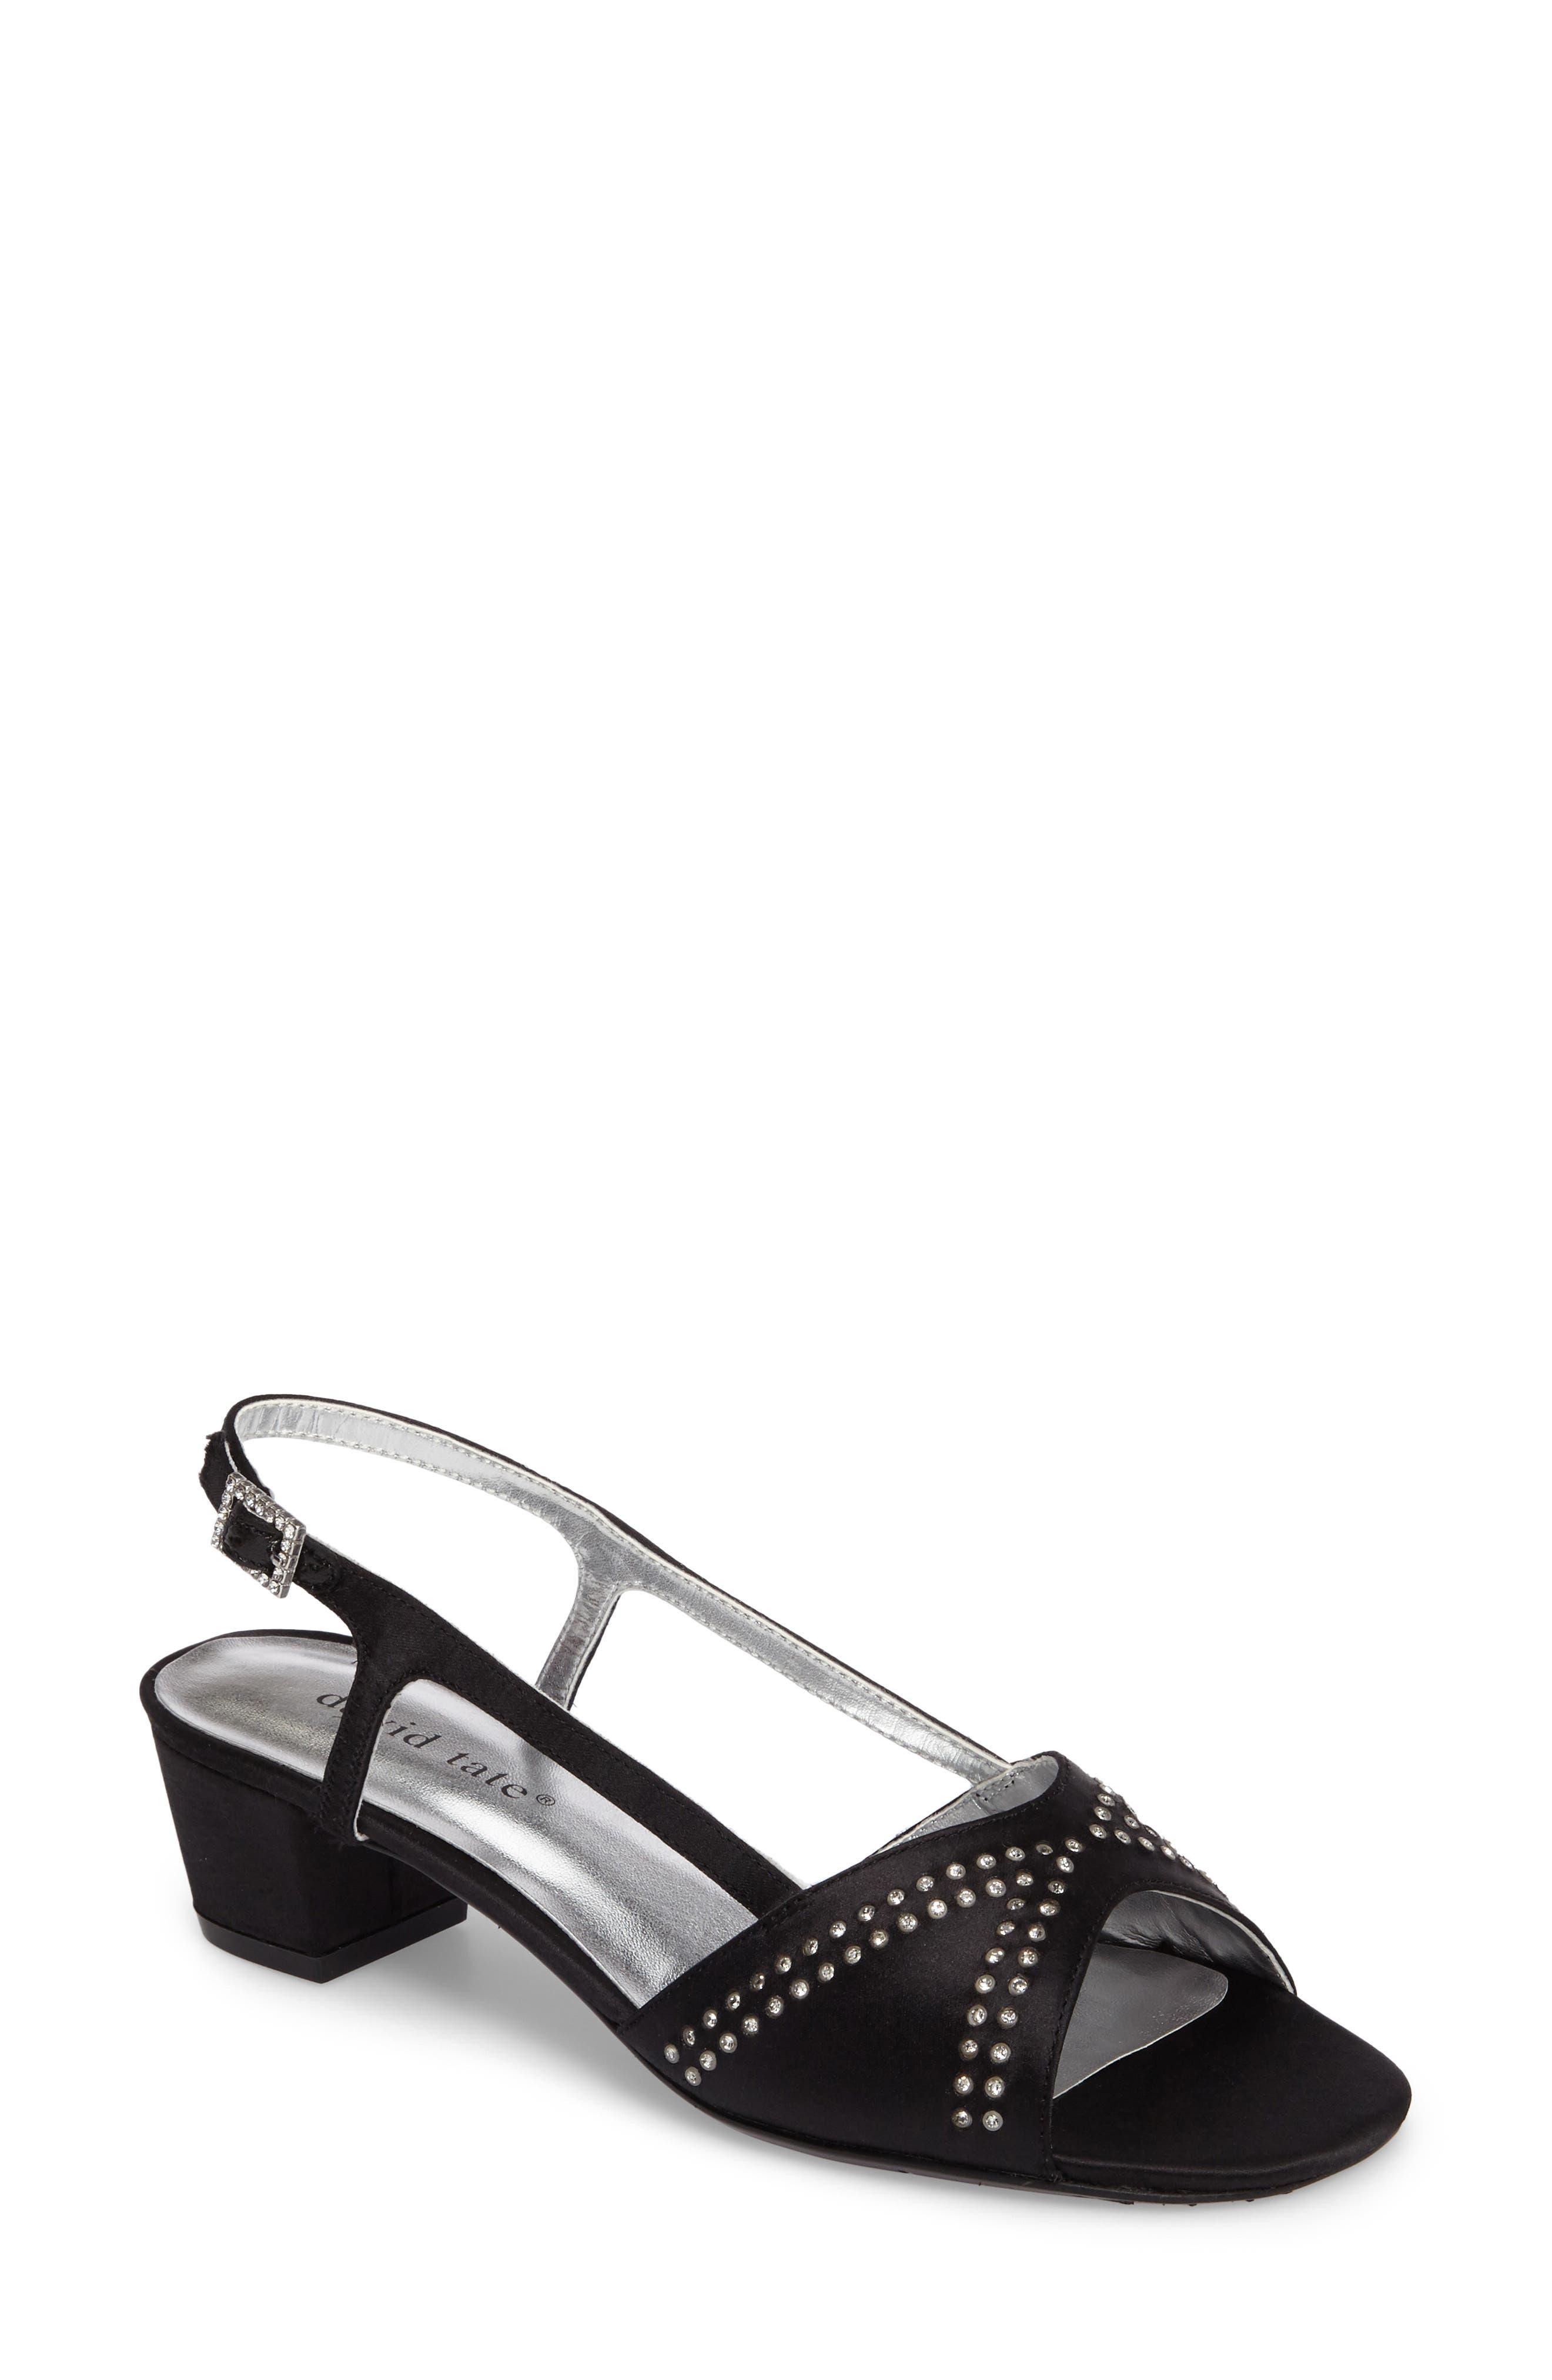 Wish Slingback Sandal,                         Main,                         color, BLACK SATIN